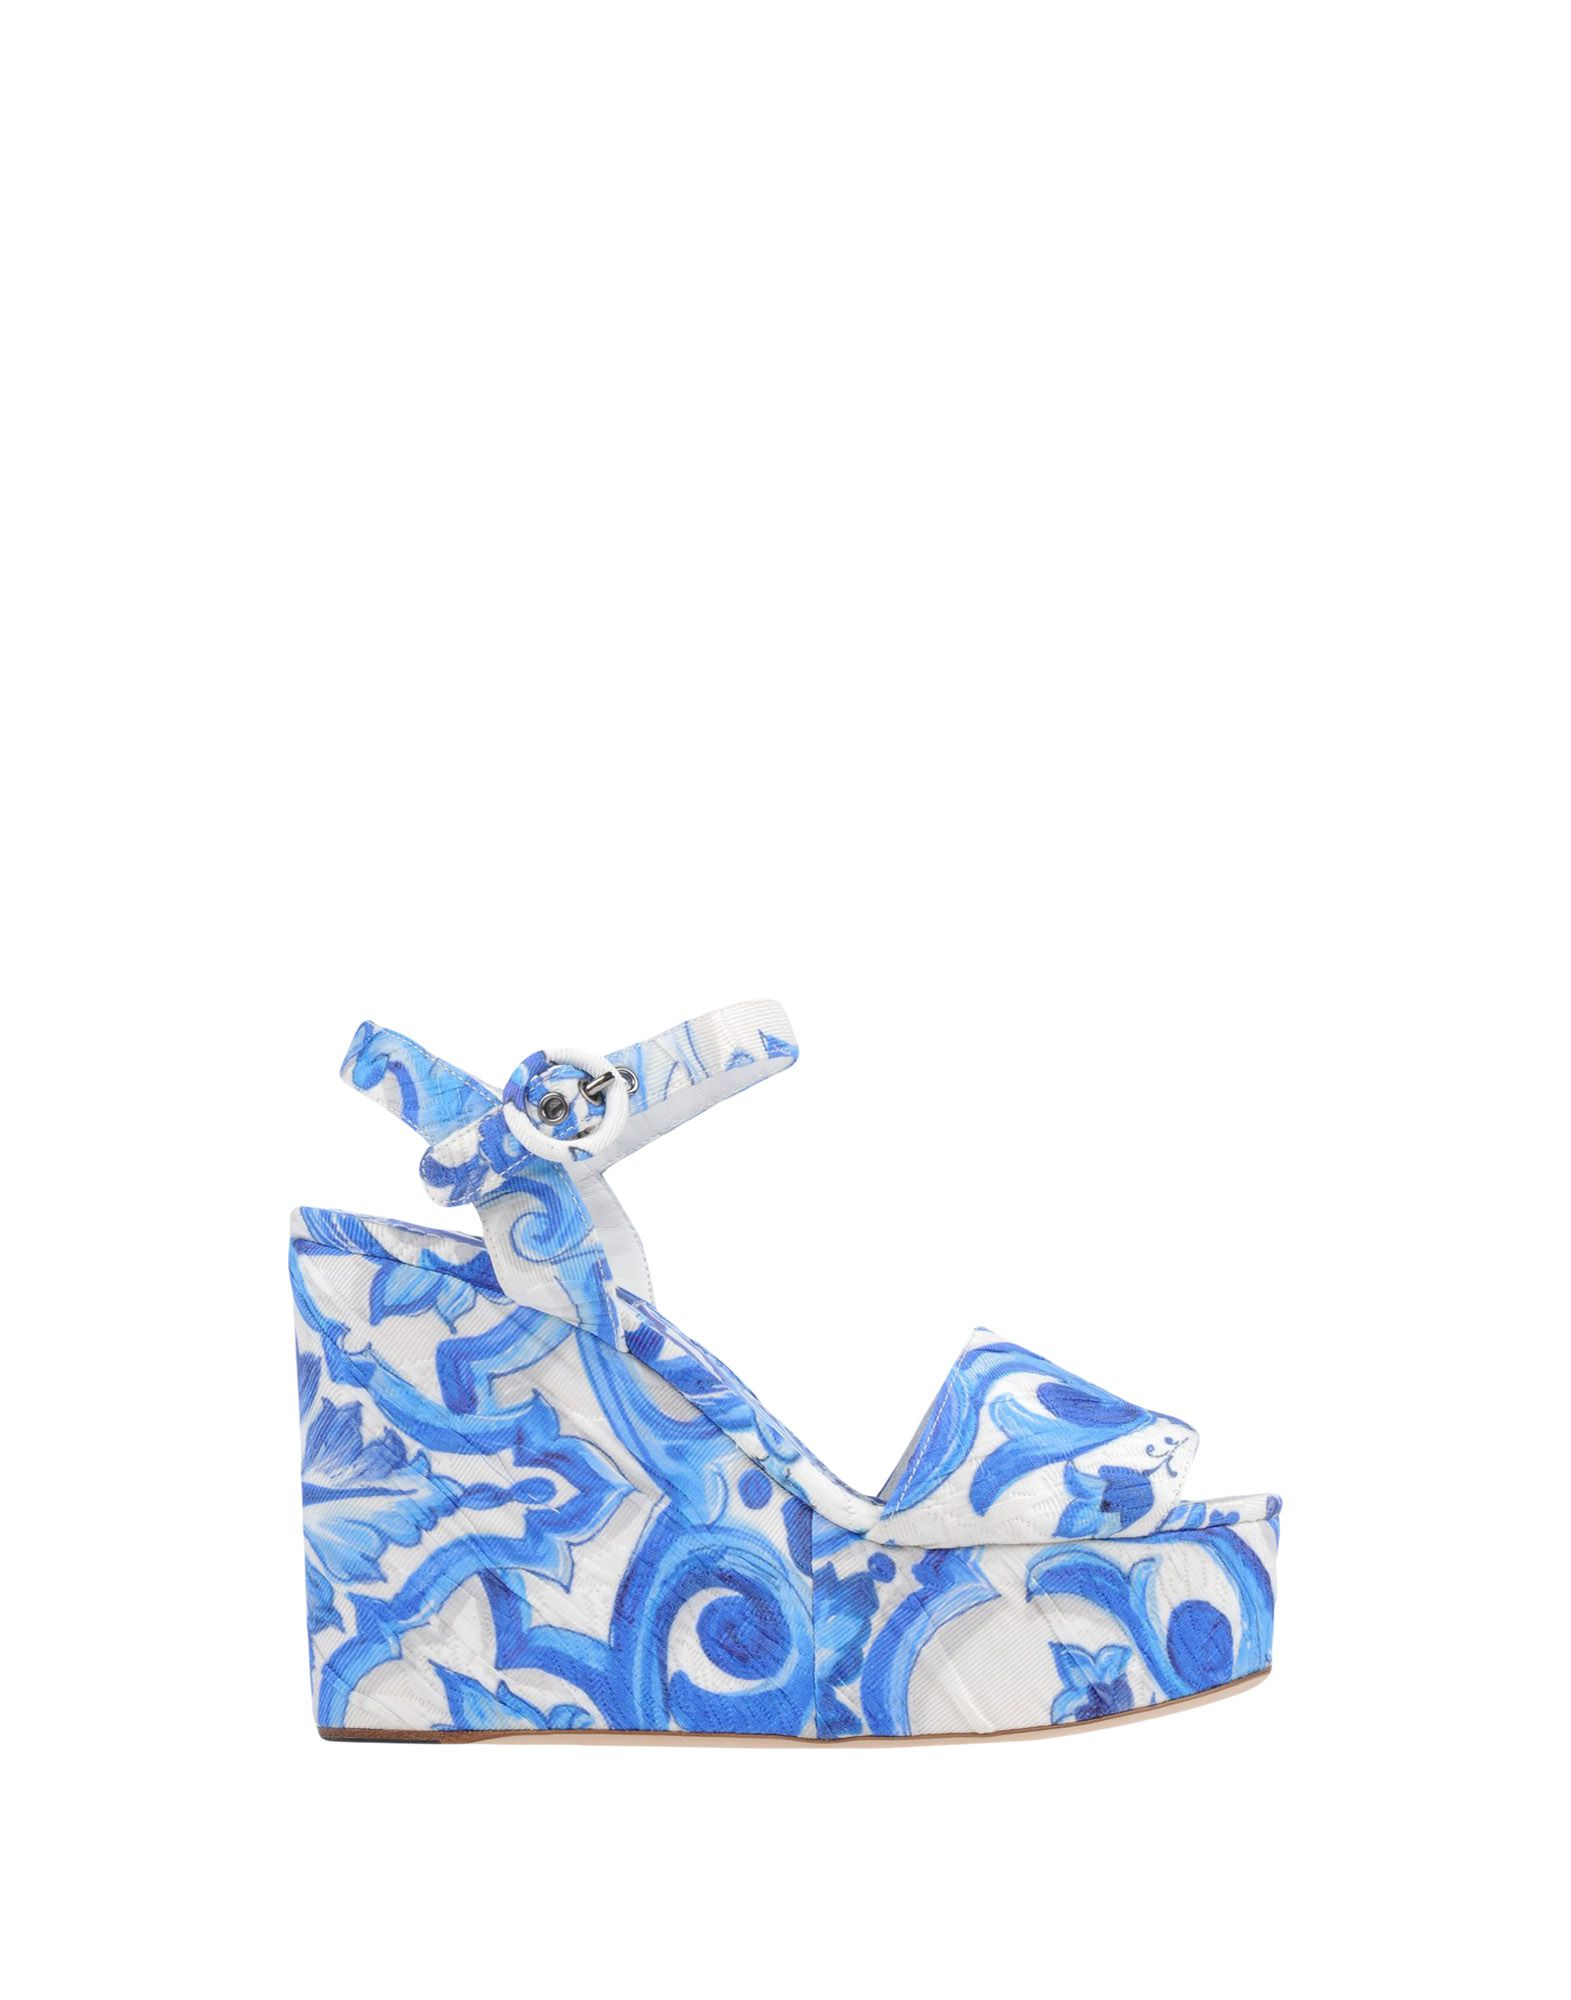 Dolce & Gabbana gut Sandalen Damen  11473229XQGünstige gut Gabbana aussehende Schuhe 296db7